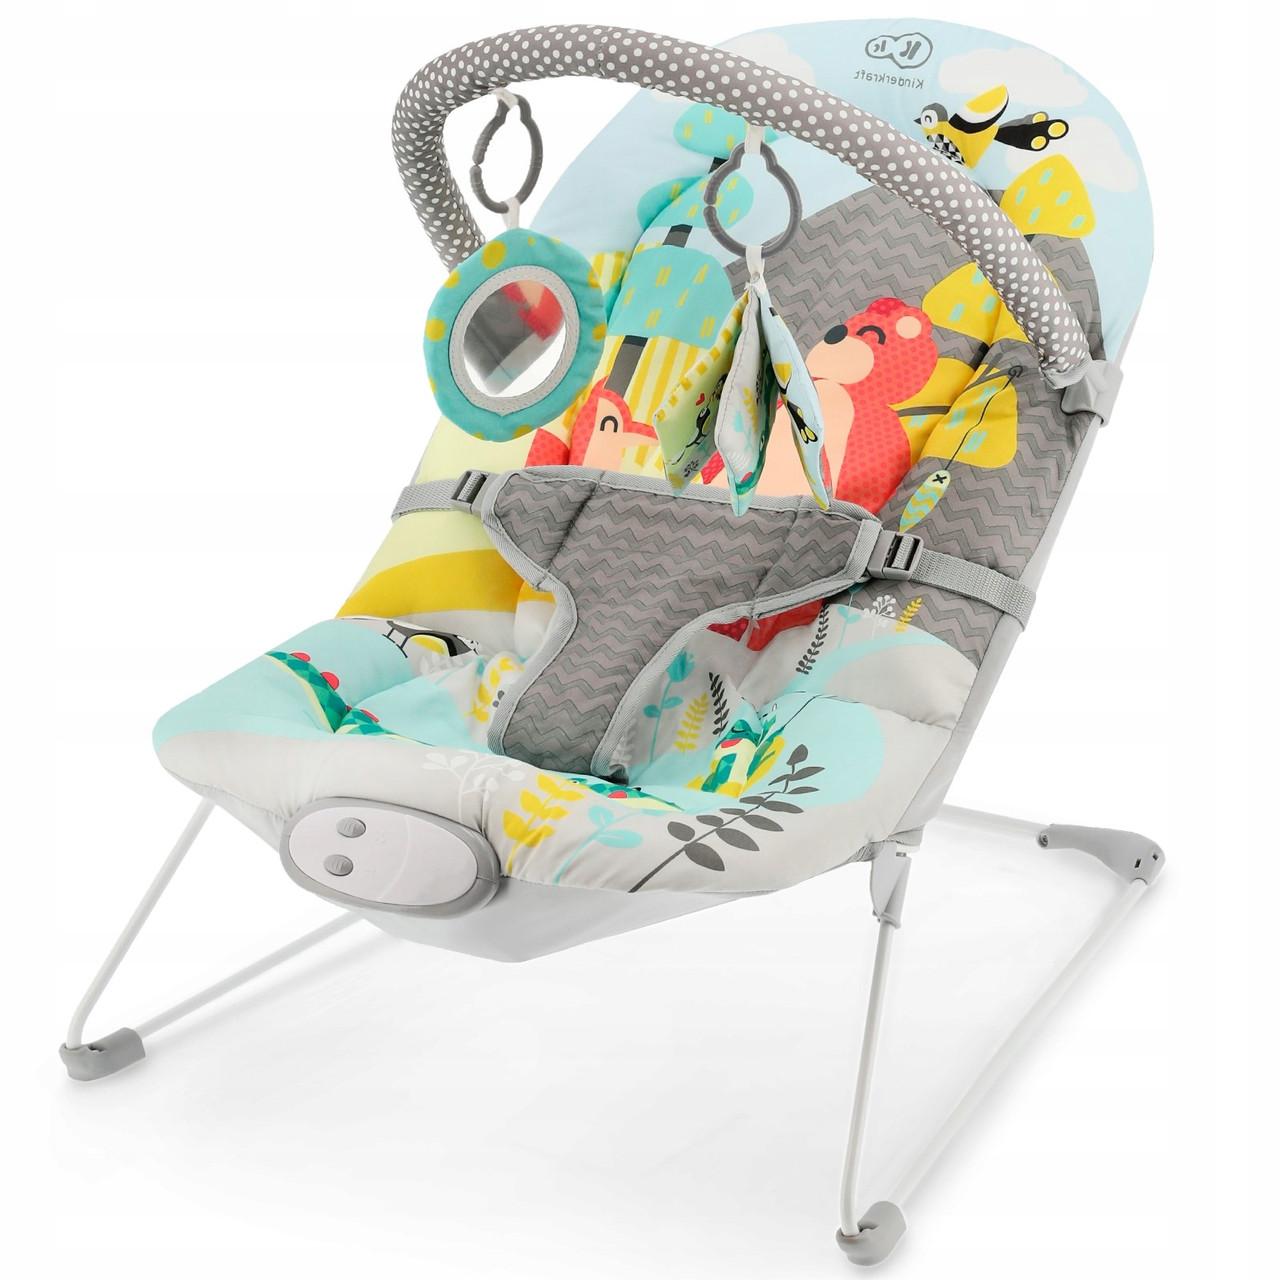 Кресло-качалка KinderKraft Milyfun